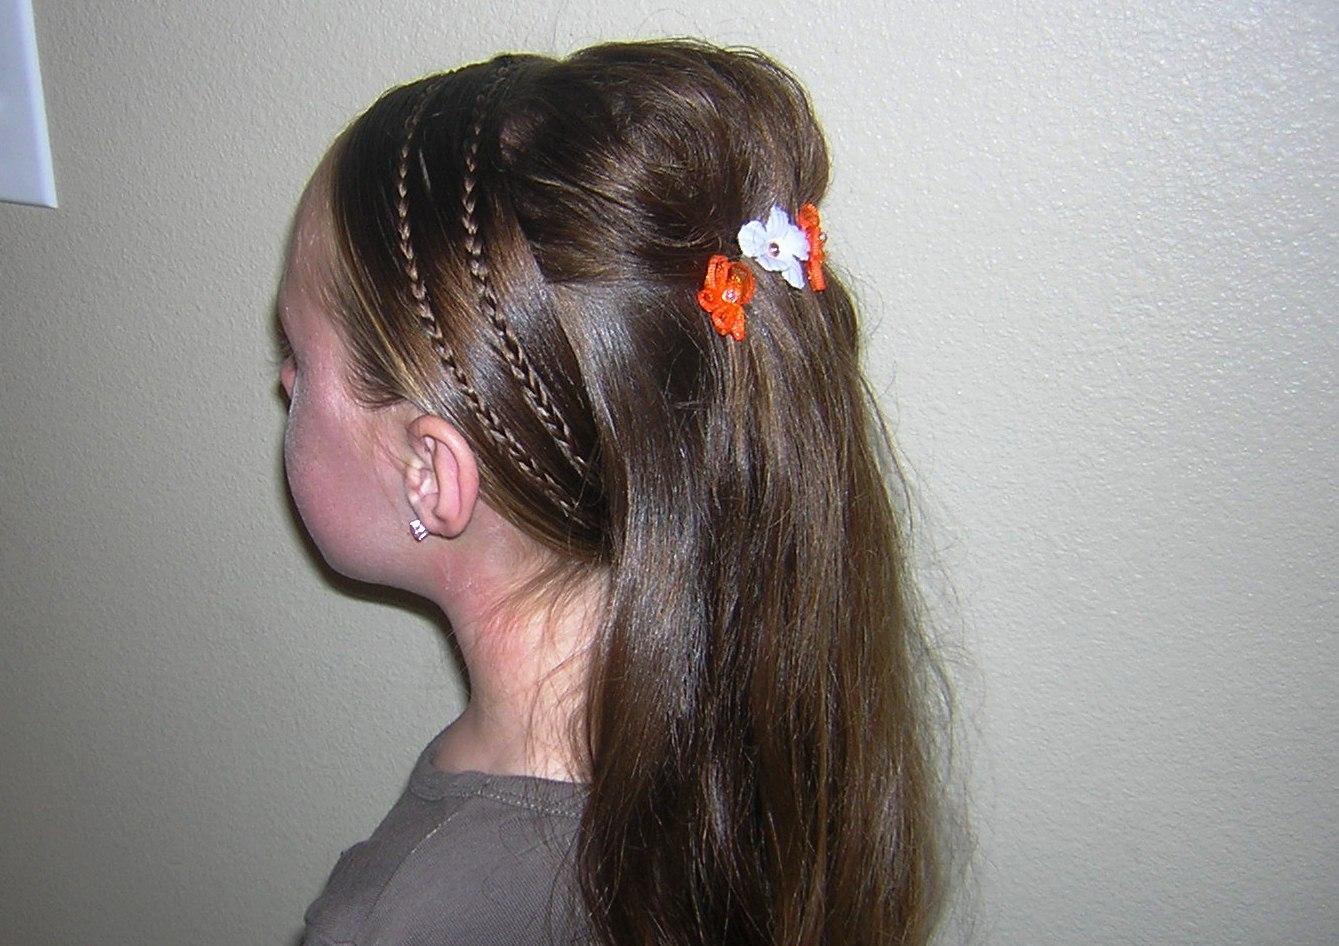 Wondrous Princess Hairstyles Little Girls Princess Hairstyles For Little Short Hairstyles Gunalazisus